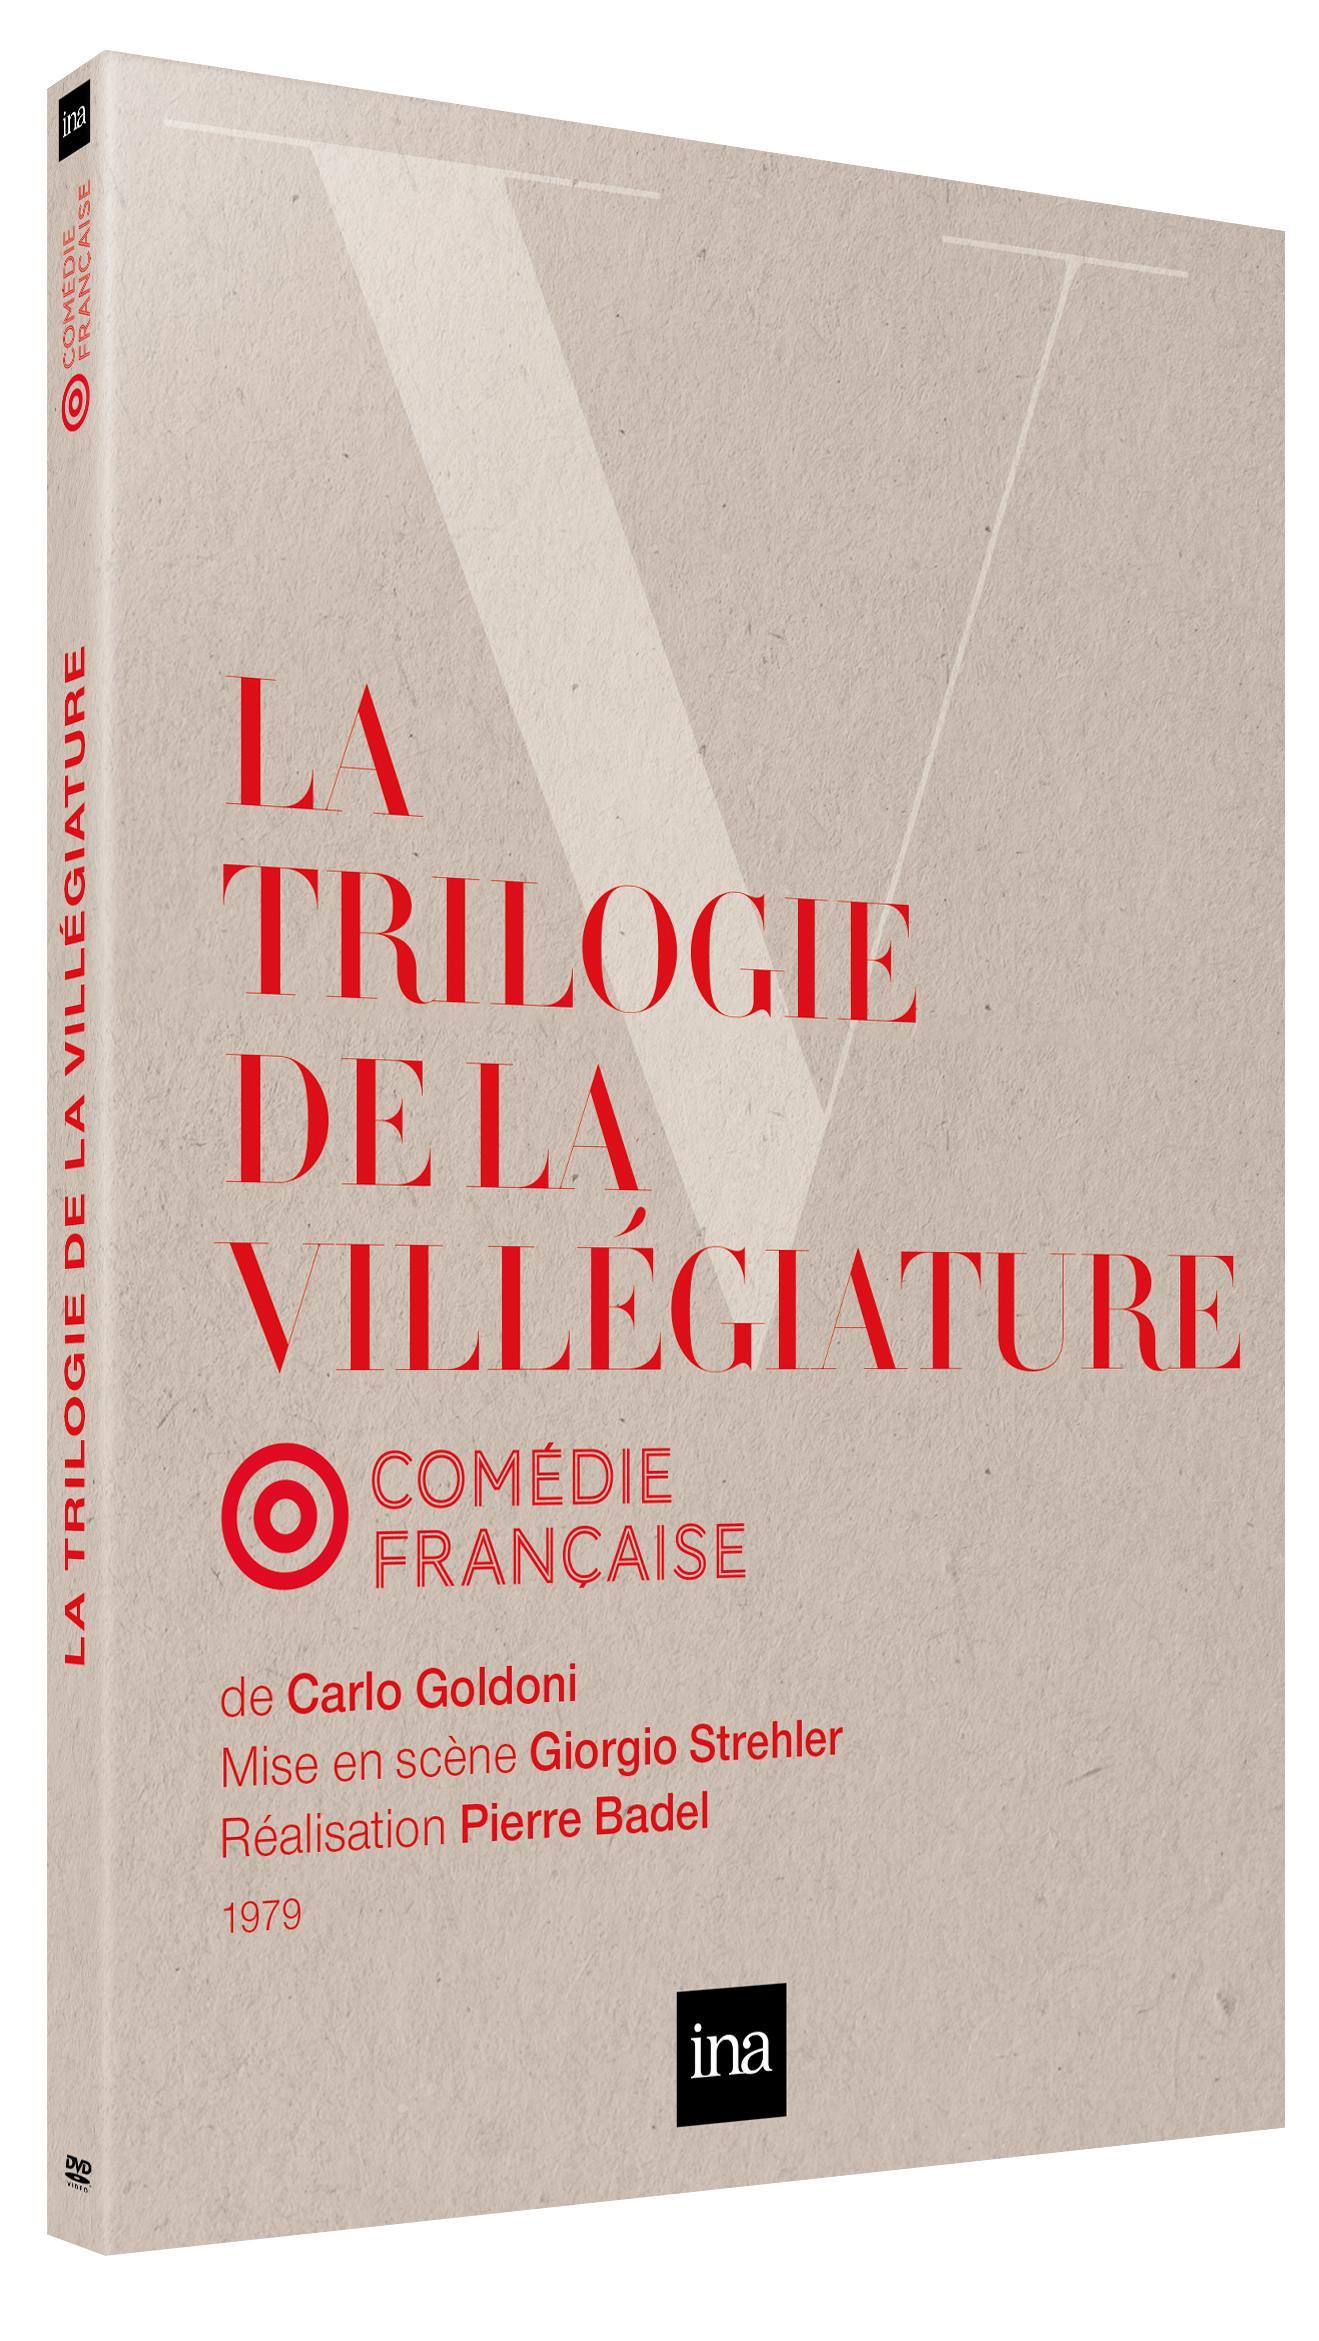 Trilogie de la villegiature (la) - dvd